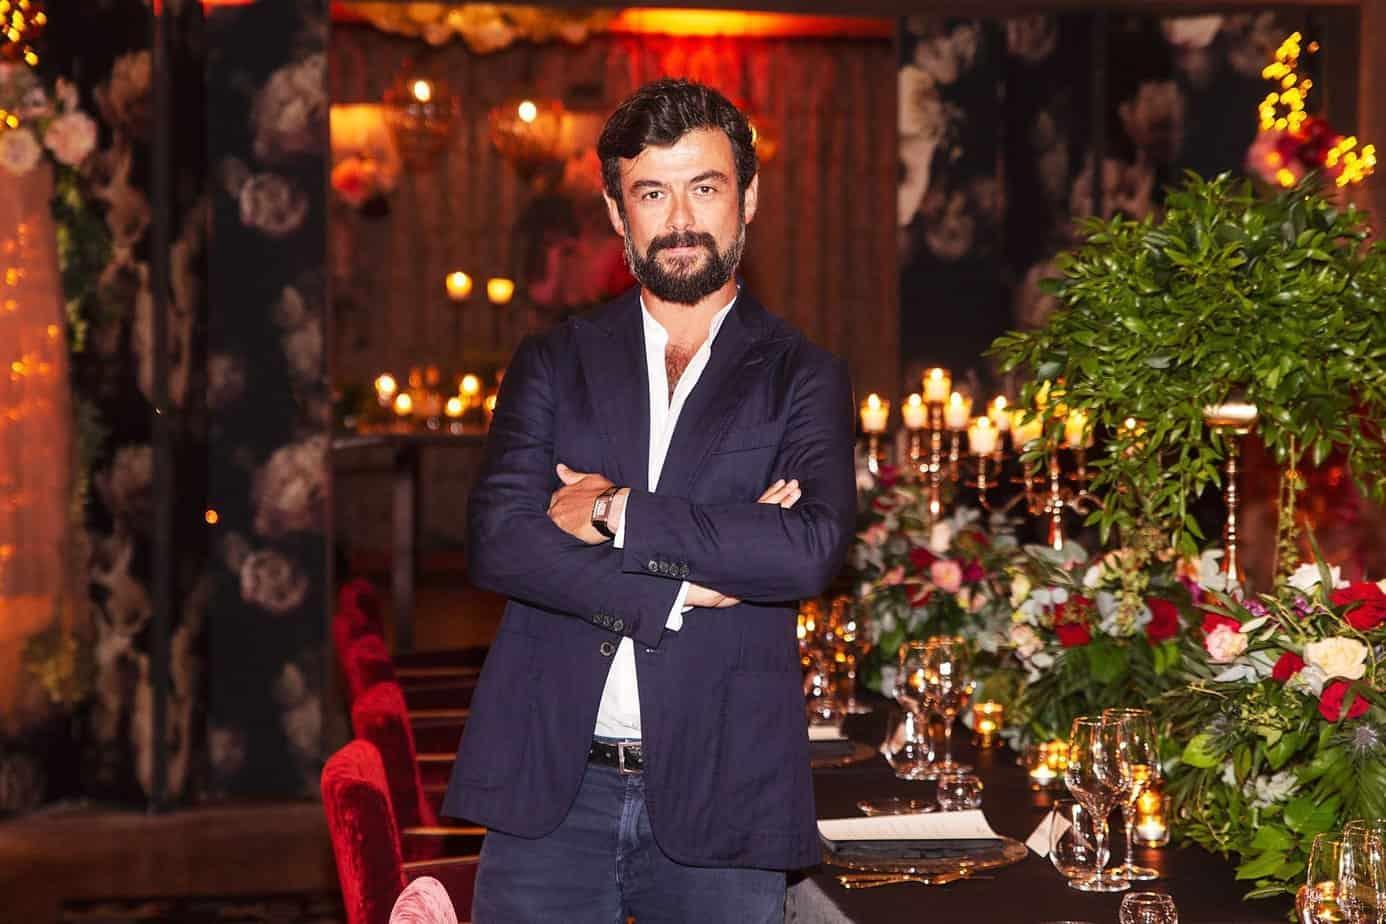 Pasqua Wines_dinner_MetRestaurant_franacescabandiera1